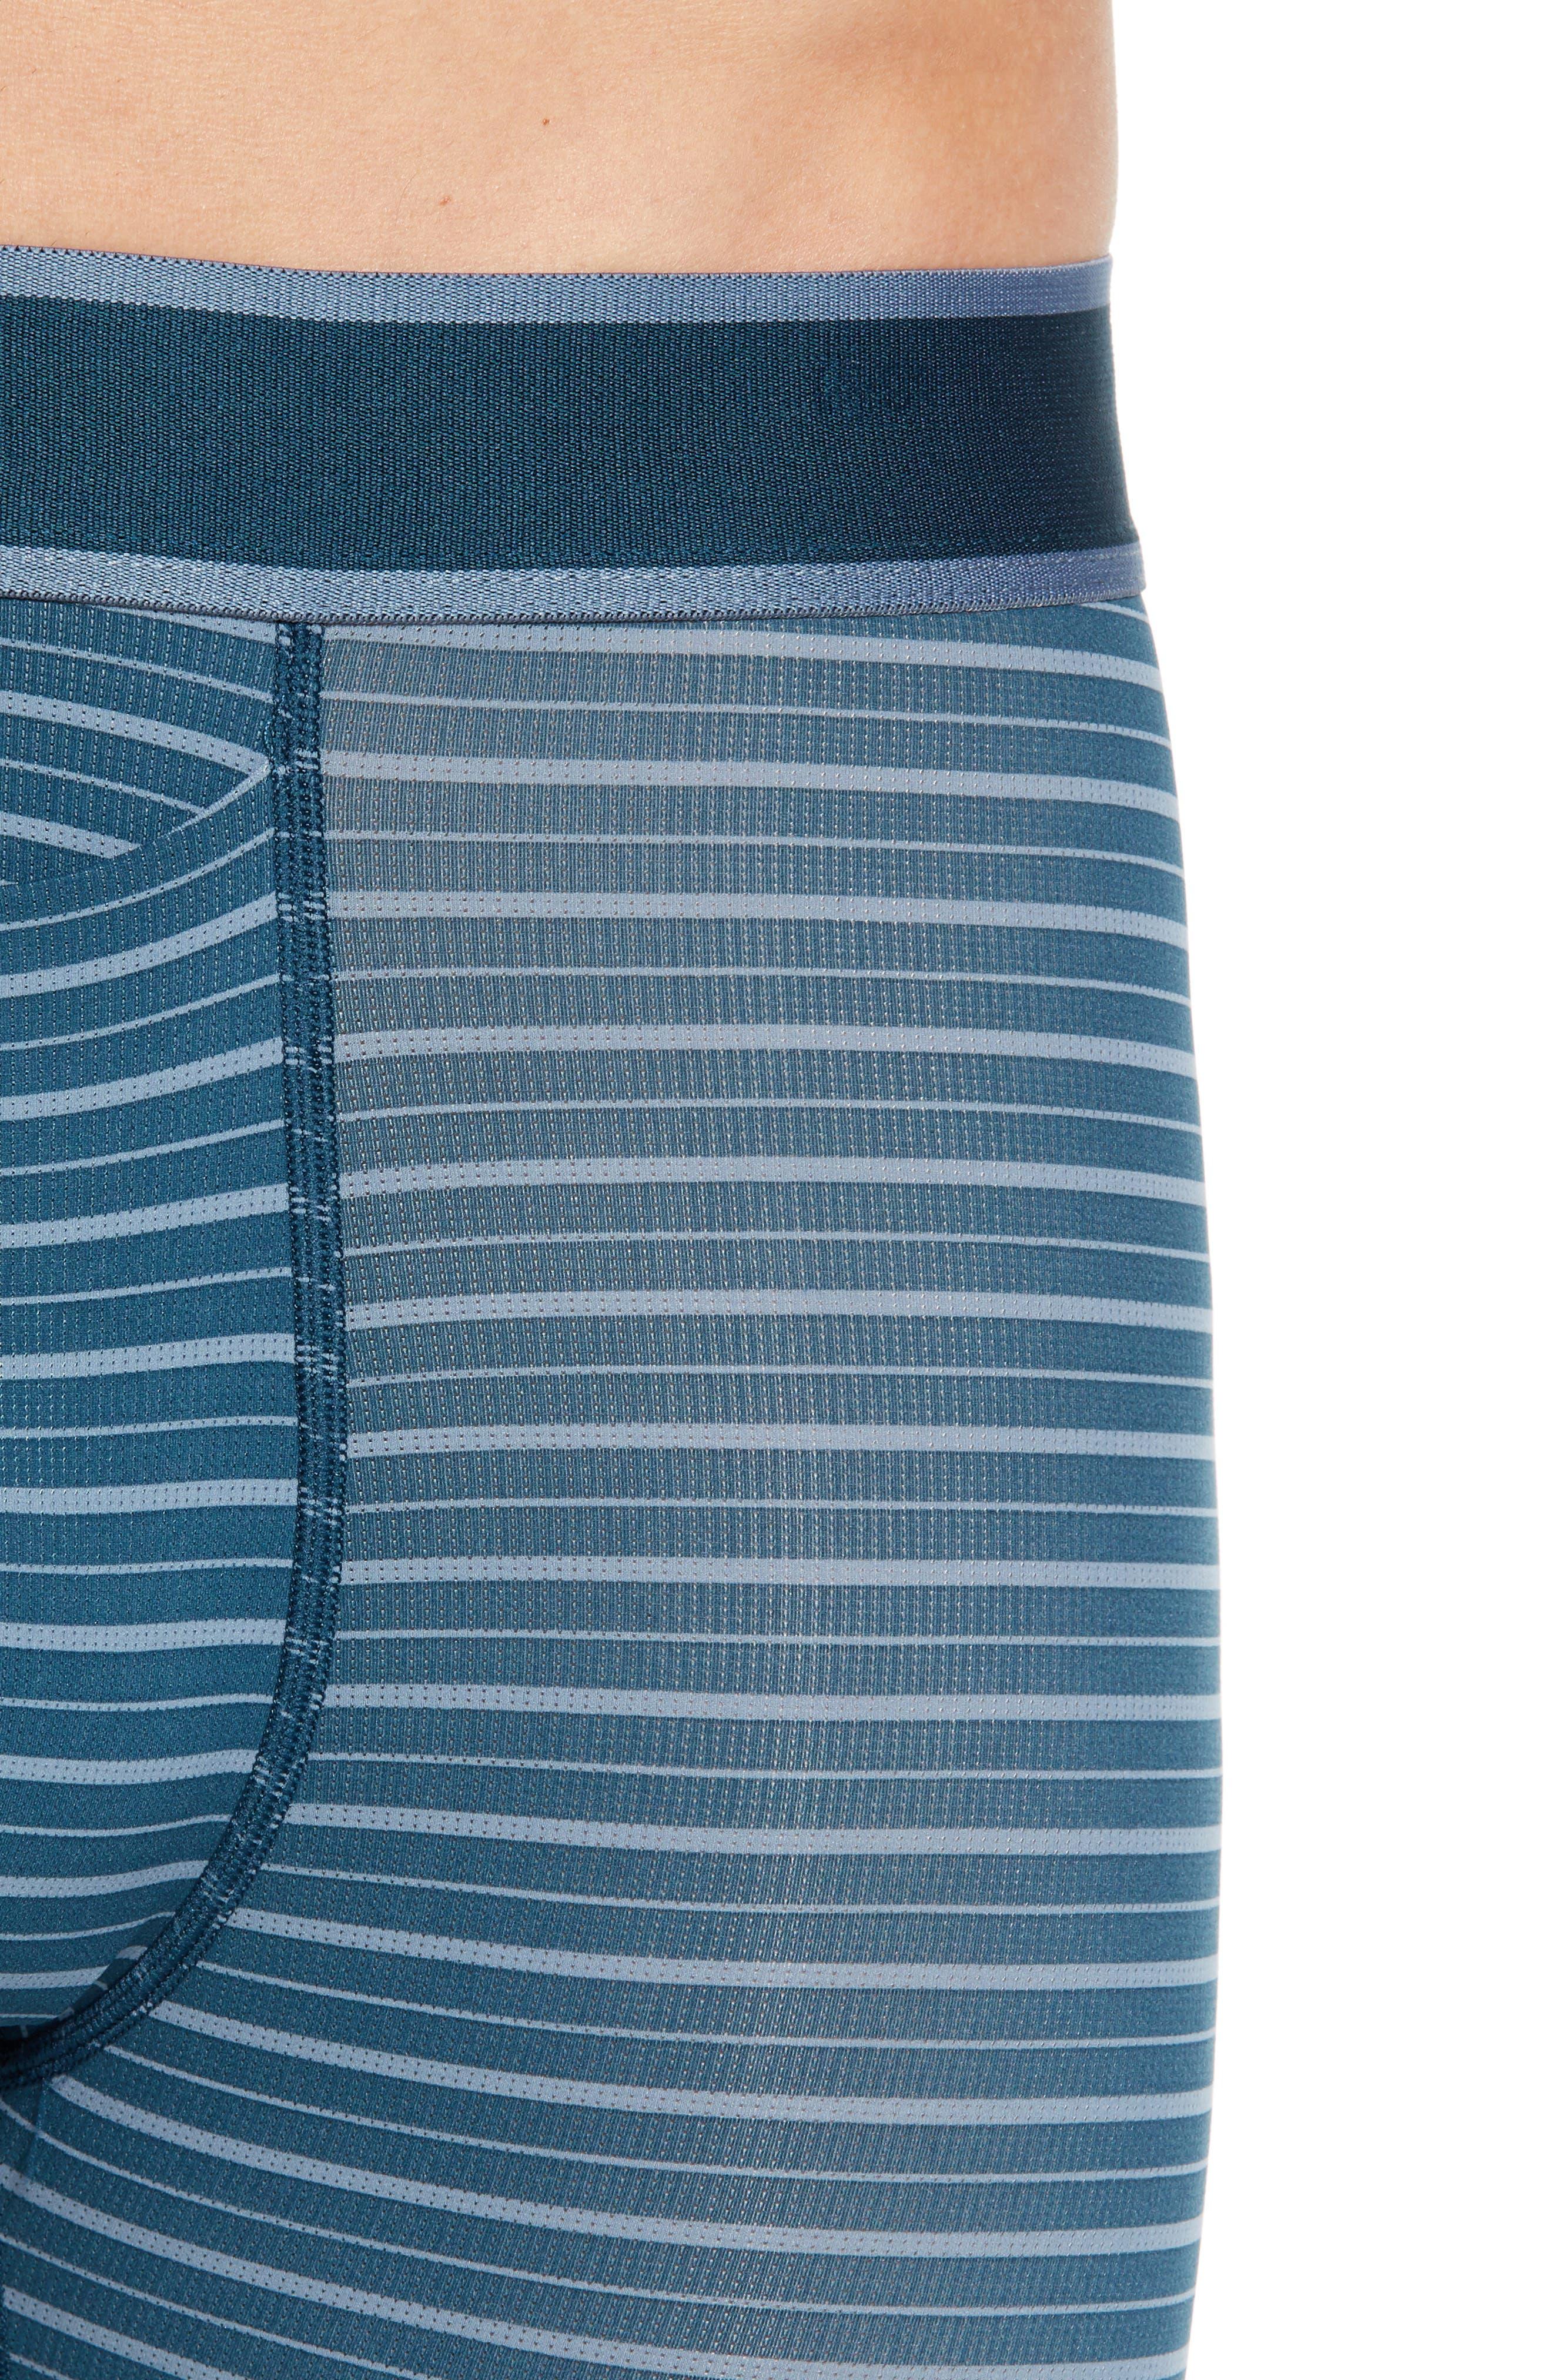 Air Boxer Briefs,                             Alternate thumbnail 4, color,                             REFLECTING POND/ BLUE MIRAGE